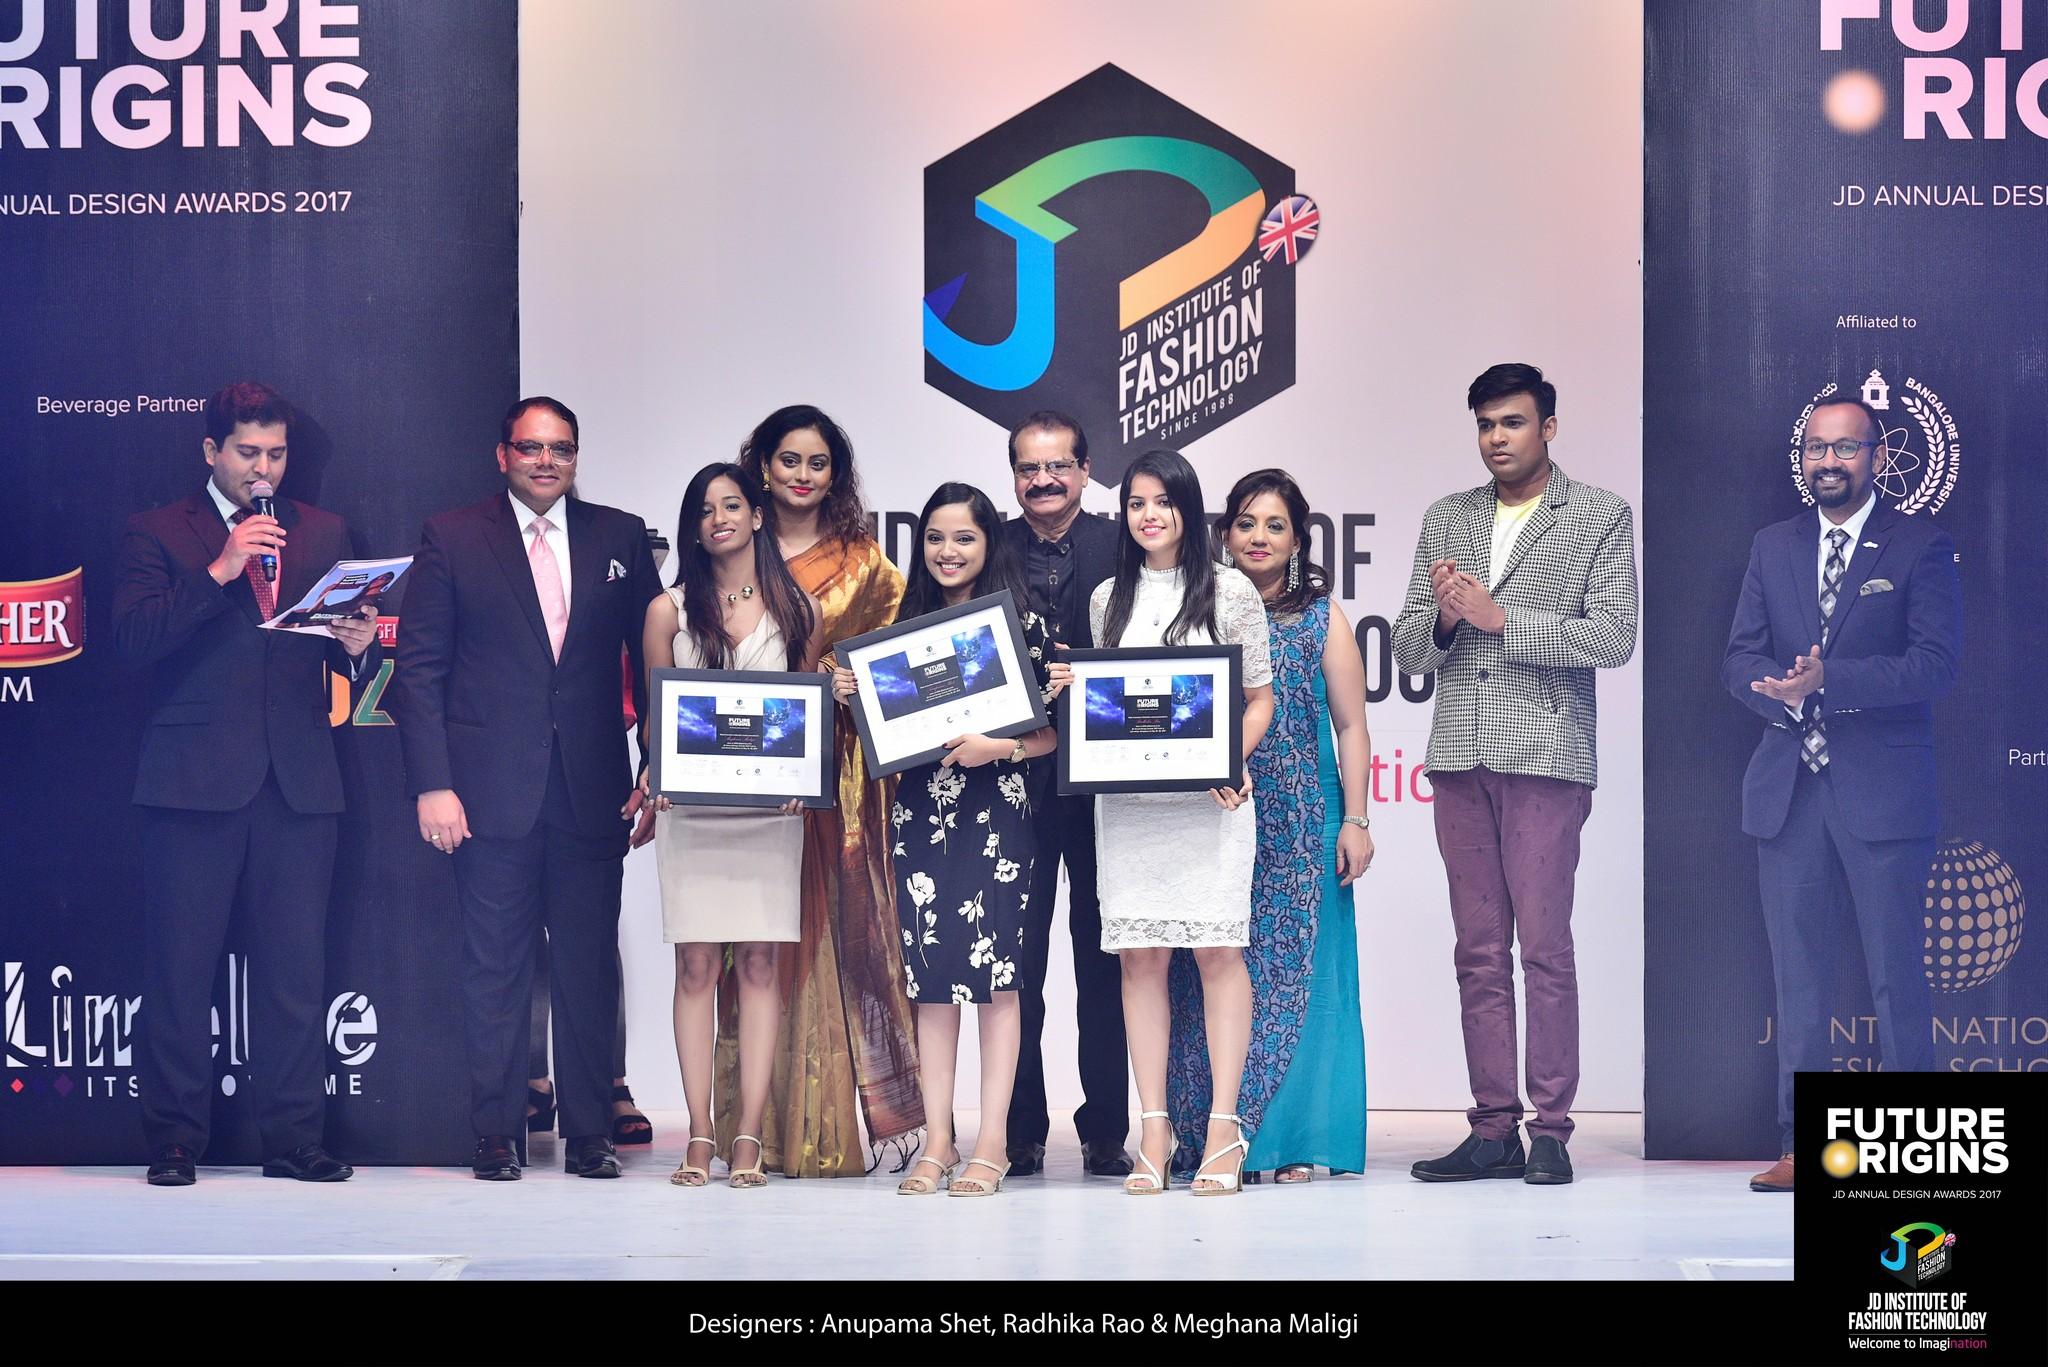 Aagami - Future Origin - JD Annual Design Awards 2017 | Photography : Jerin Nath aagami - Aagami Future Origin JD Annual Design Awards 2017 8 - Aagami – Future Origin – JD Annual Design Awards 2017